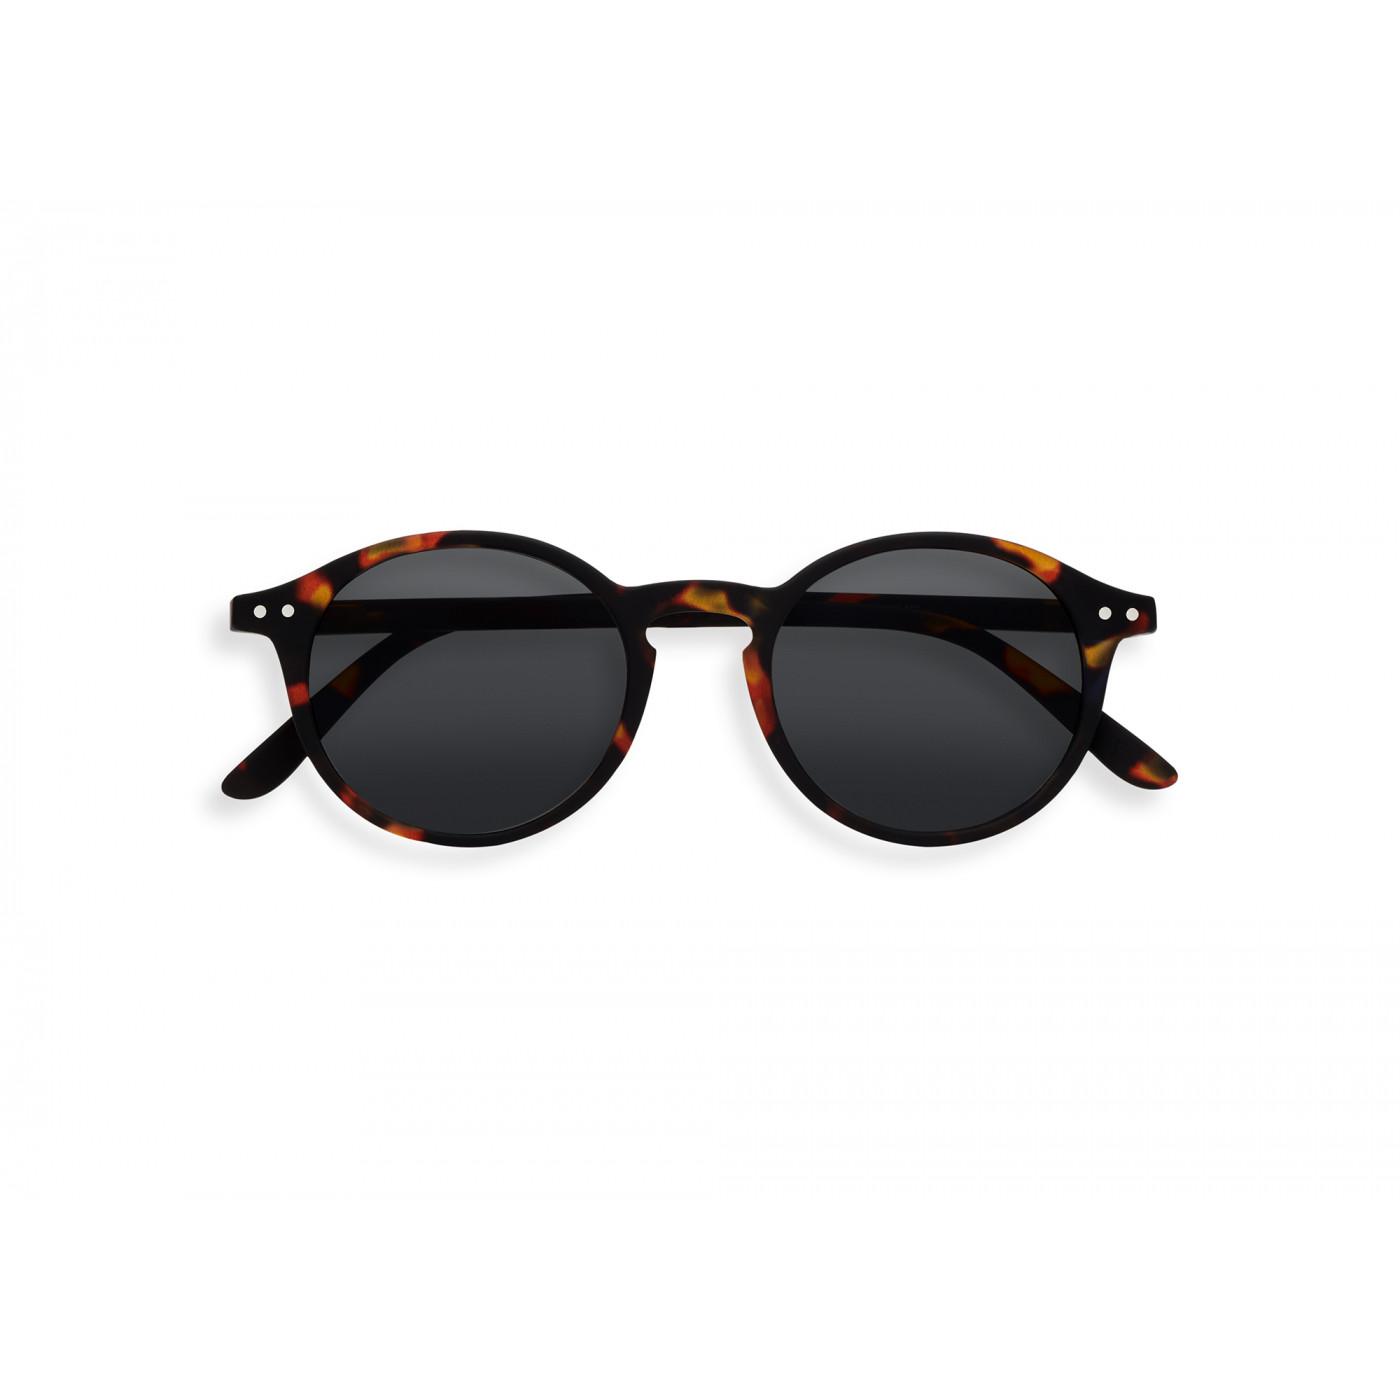 IZIPIZI   #D款 玳瑁/灰色鏡片 復古圓框太陽眼鏡